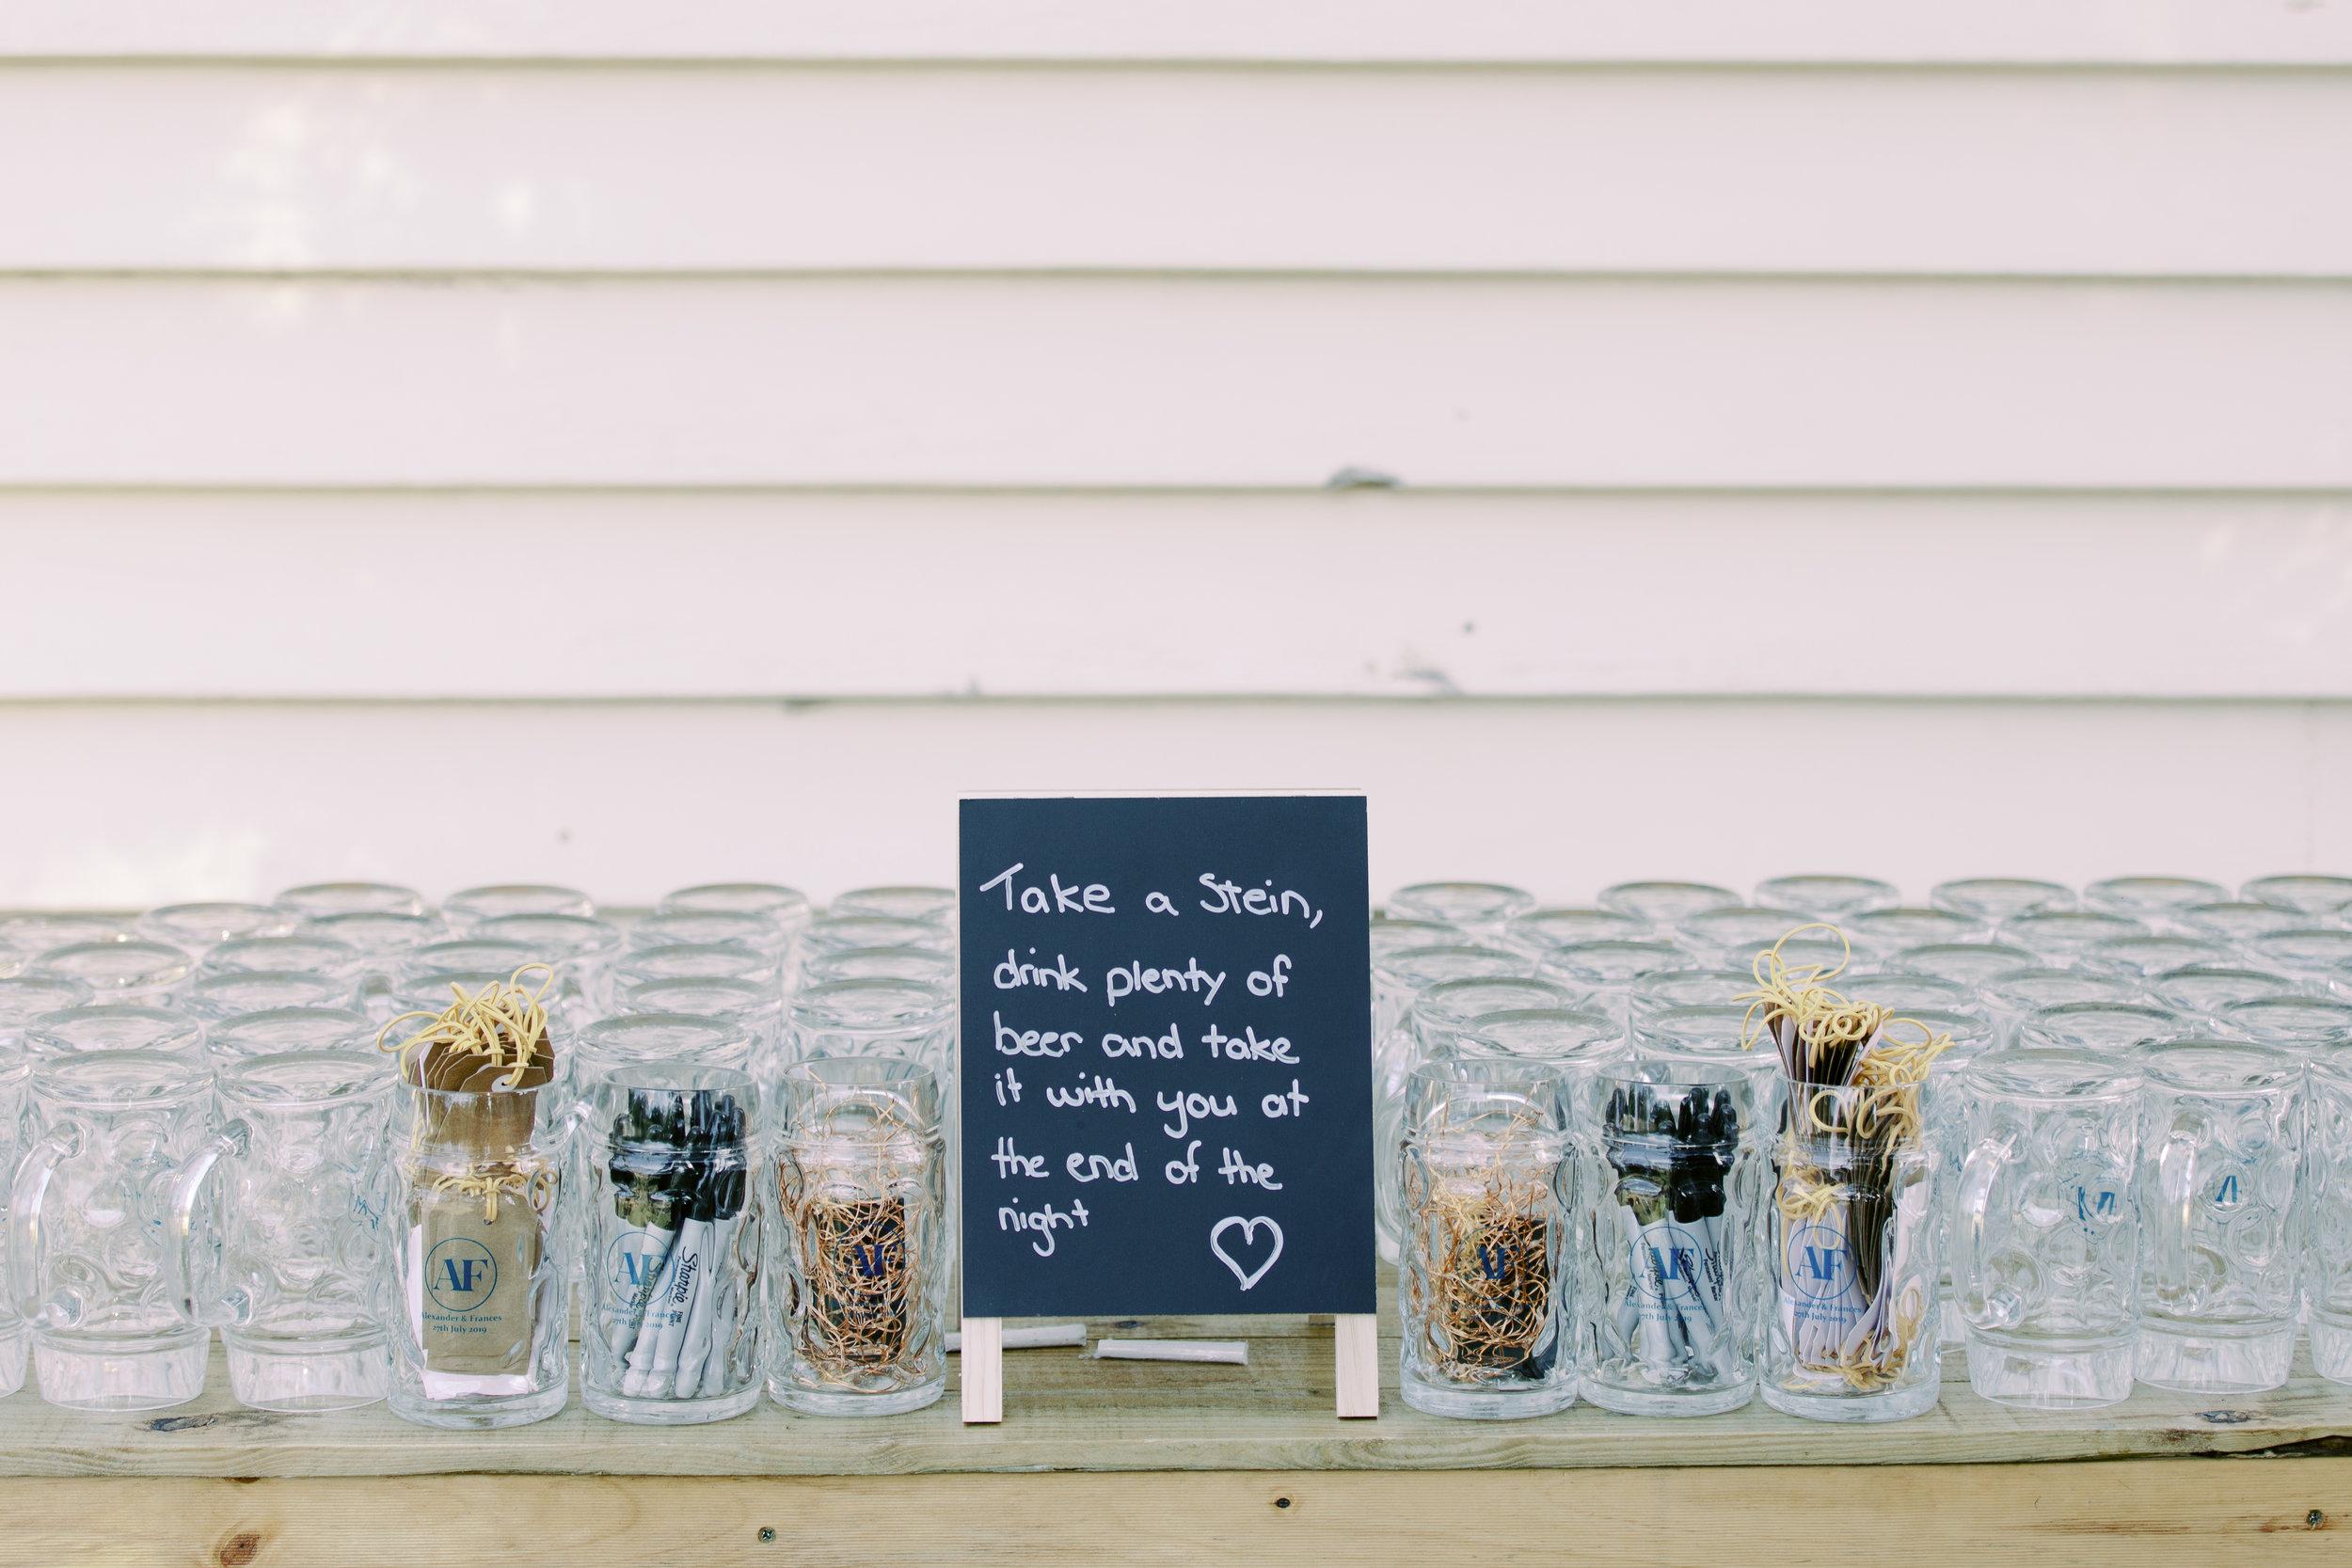 brisbane-gold-coast-sunshine-coast-tweed-romantic-fine-art-wedding-photography-lauren-olivia-49.jpg